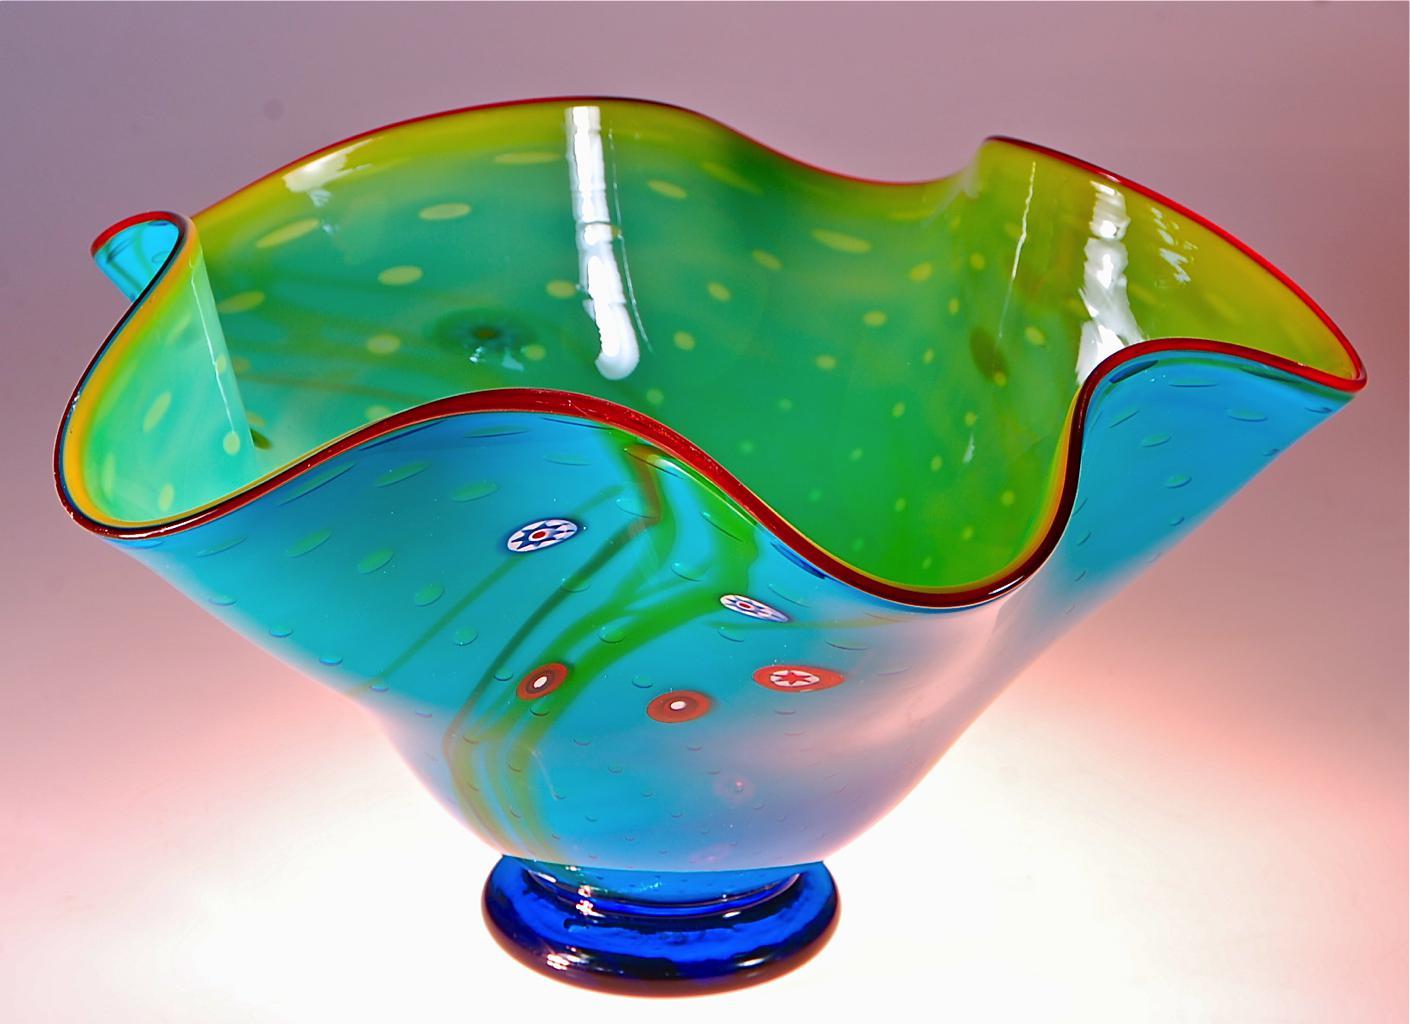 Aquarium Salad Bowl